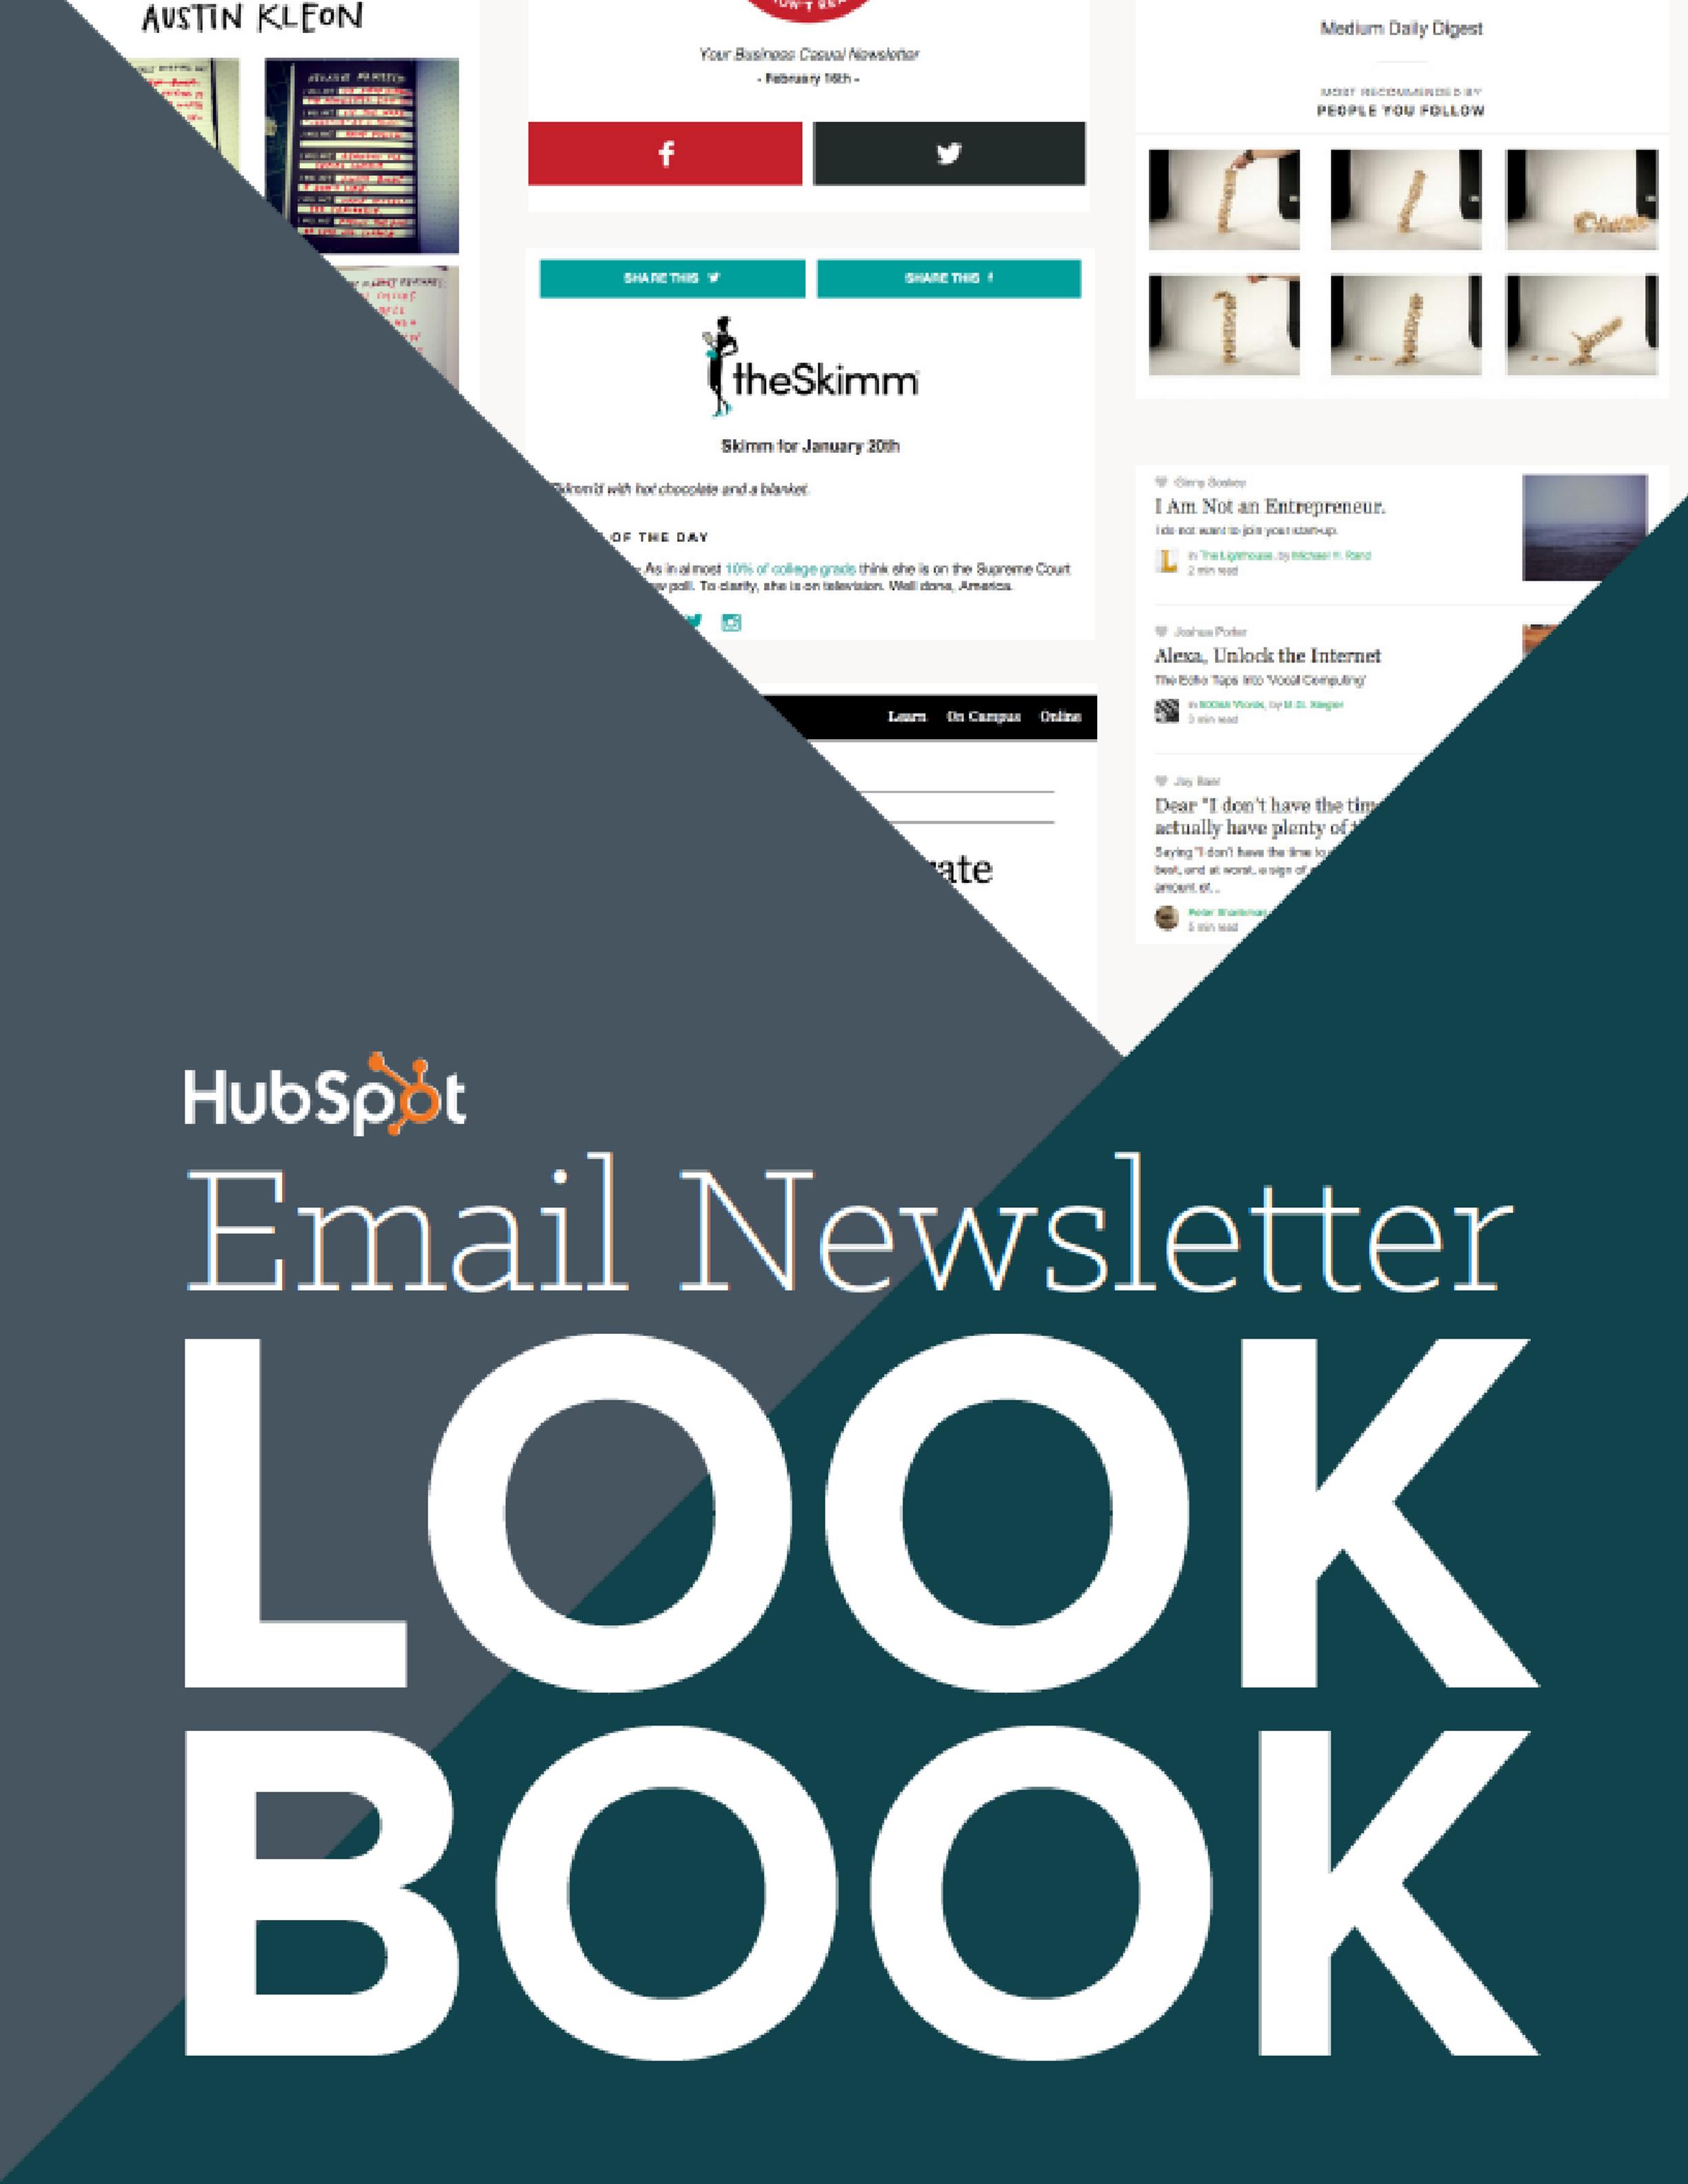 Email newsletter lookbook for startups and entrepreneurs